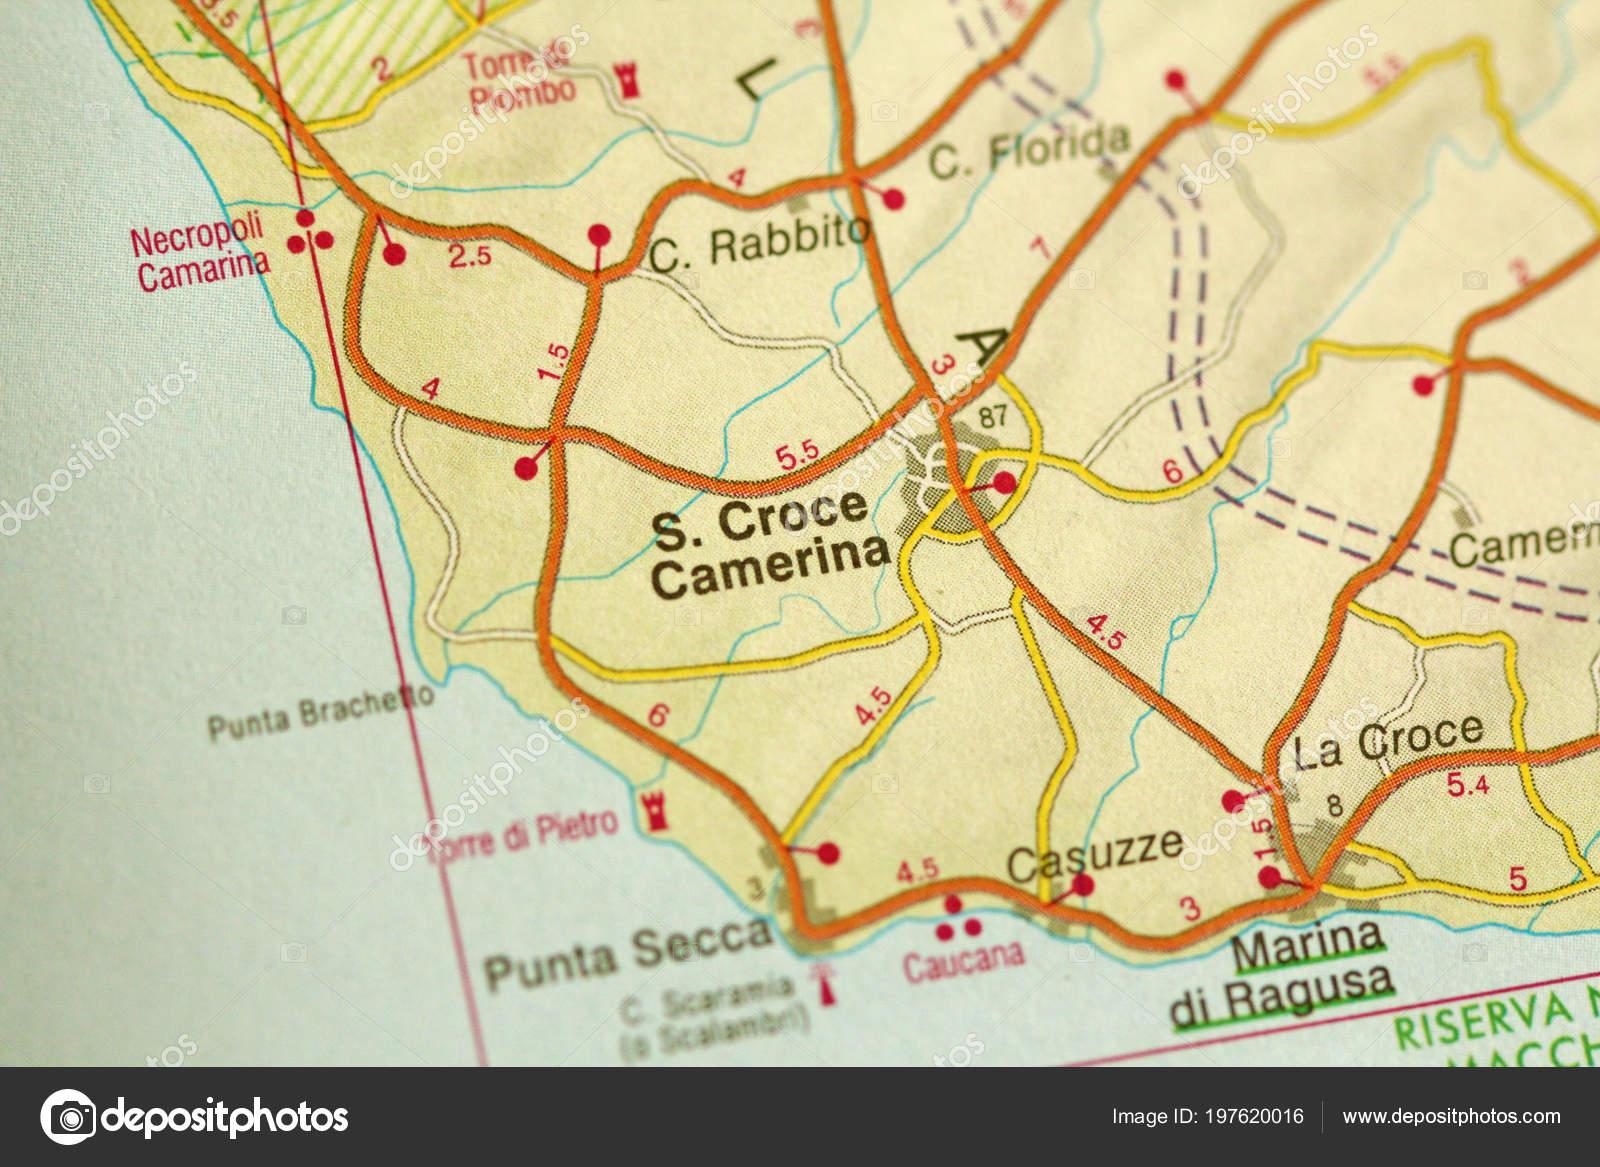 Croce Camerina Map Islands Sicily Italy — Stock Photo ...